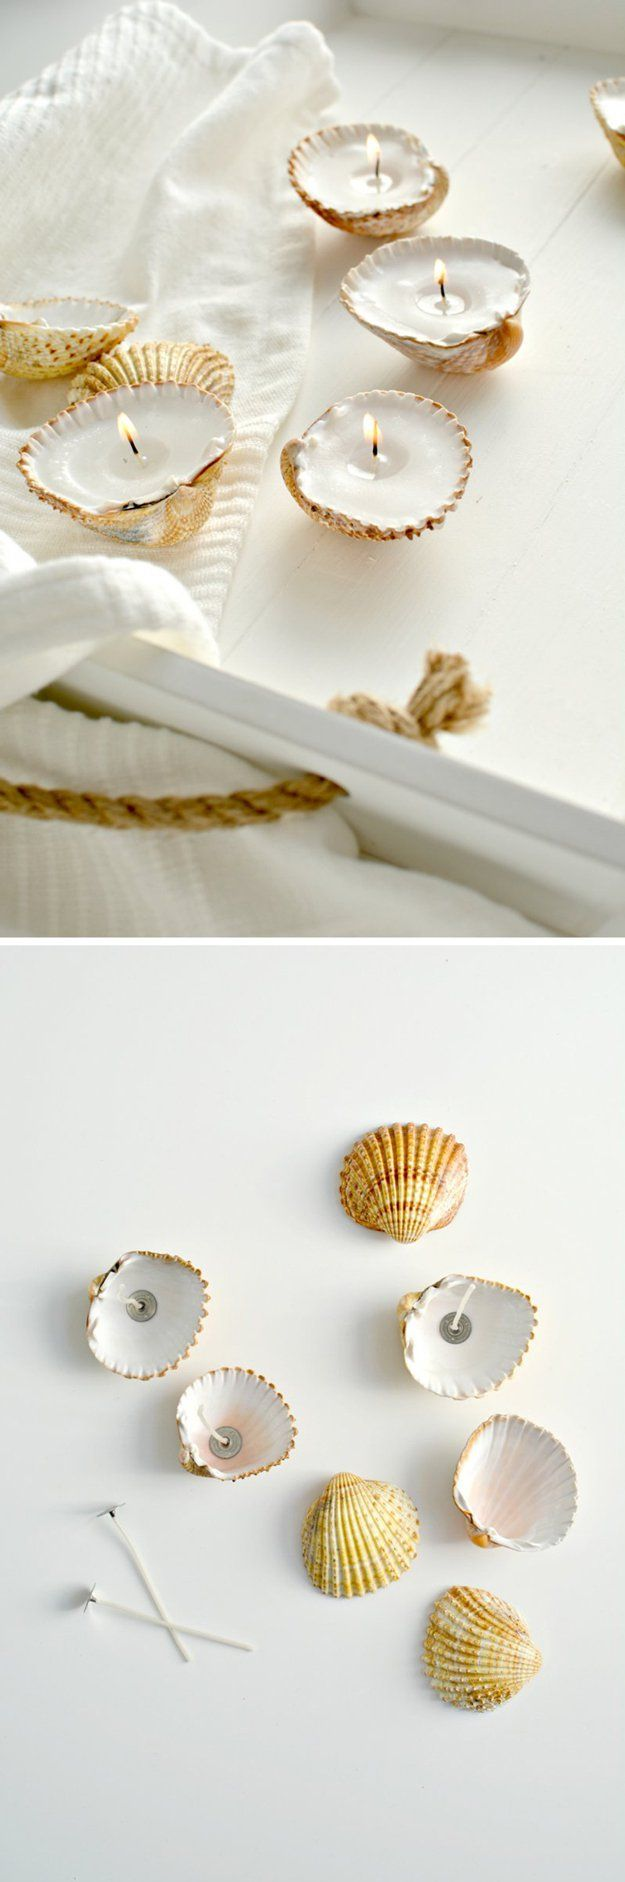 DIY Candle Tutorials for Bathroom Decor   Handmade Shell Candles by DIY Ready at http://diyready.com/bathroom-decorating-ideas-on-a-budget/